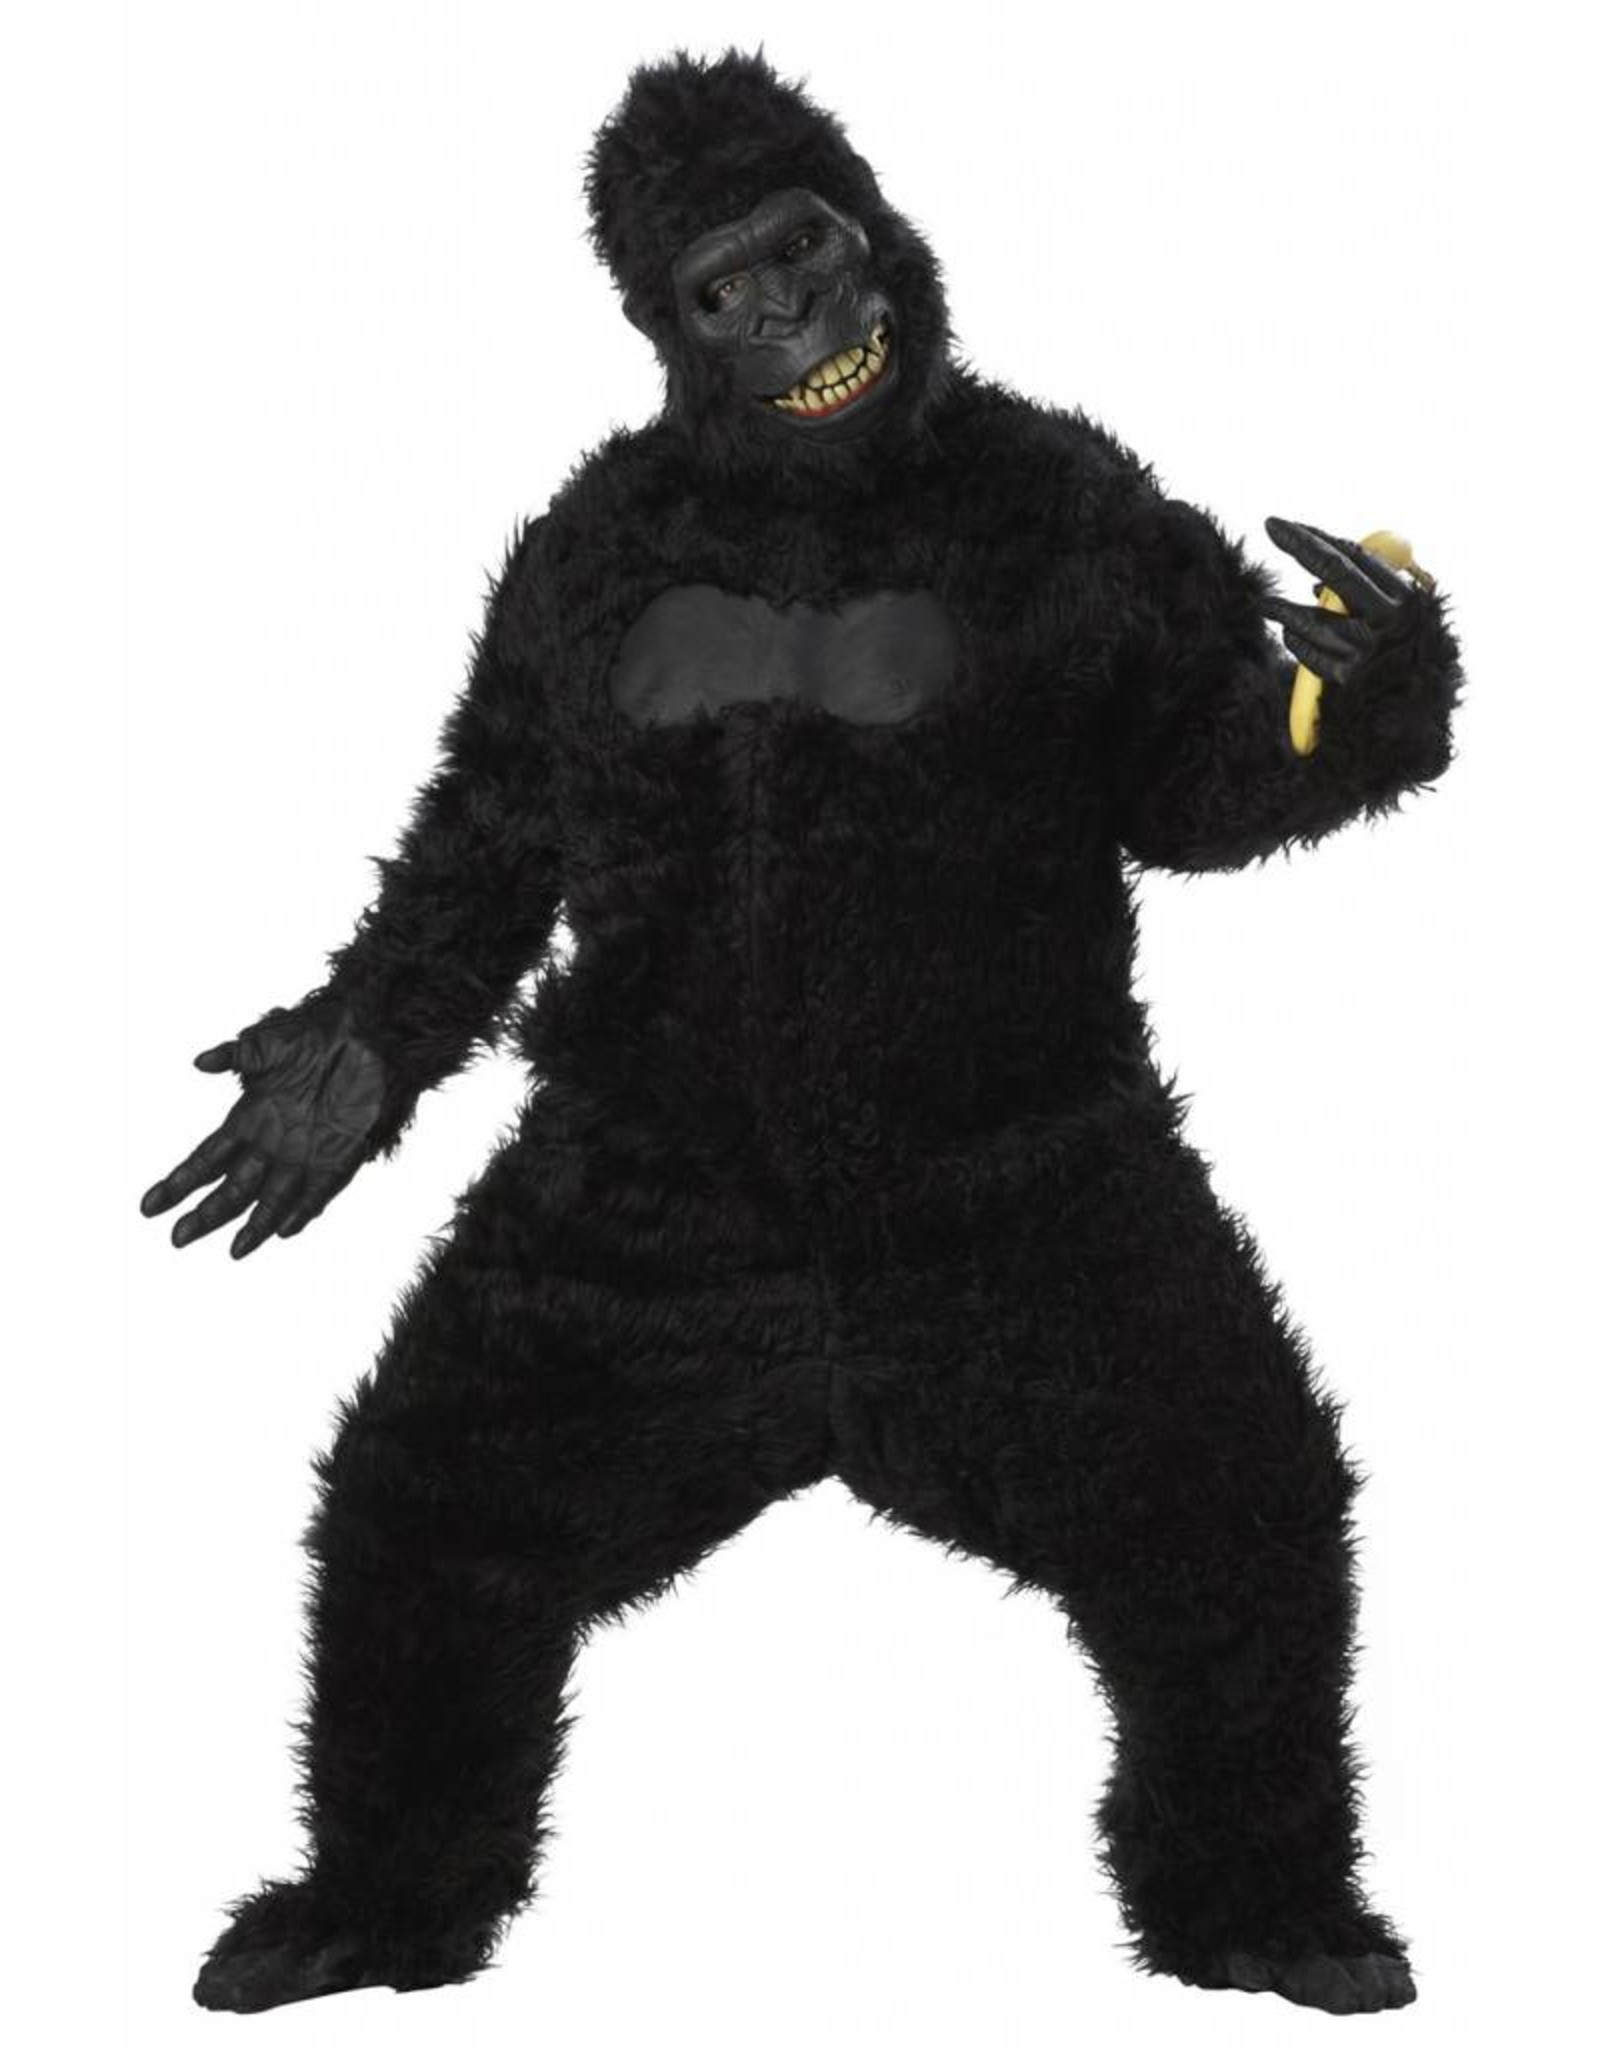 California Costume Goin' Ape Gorilla